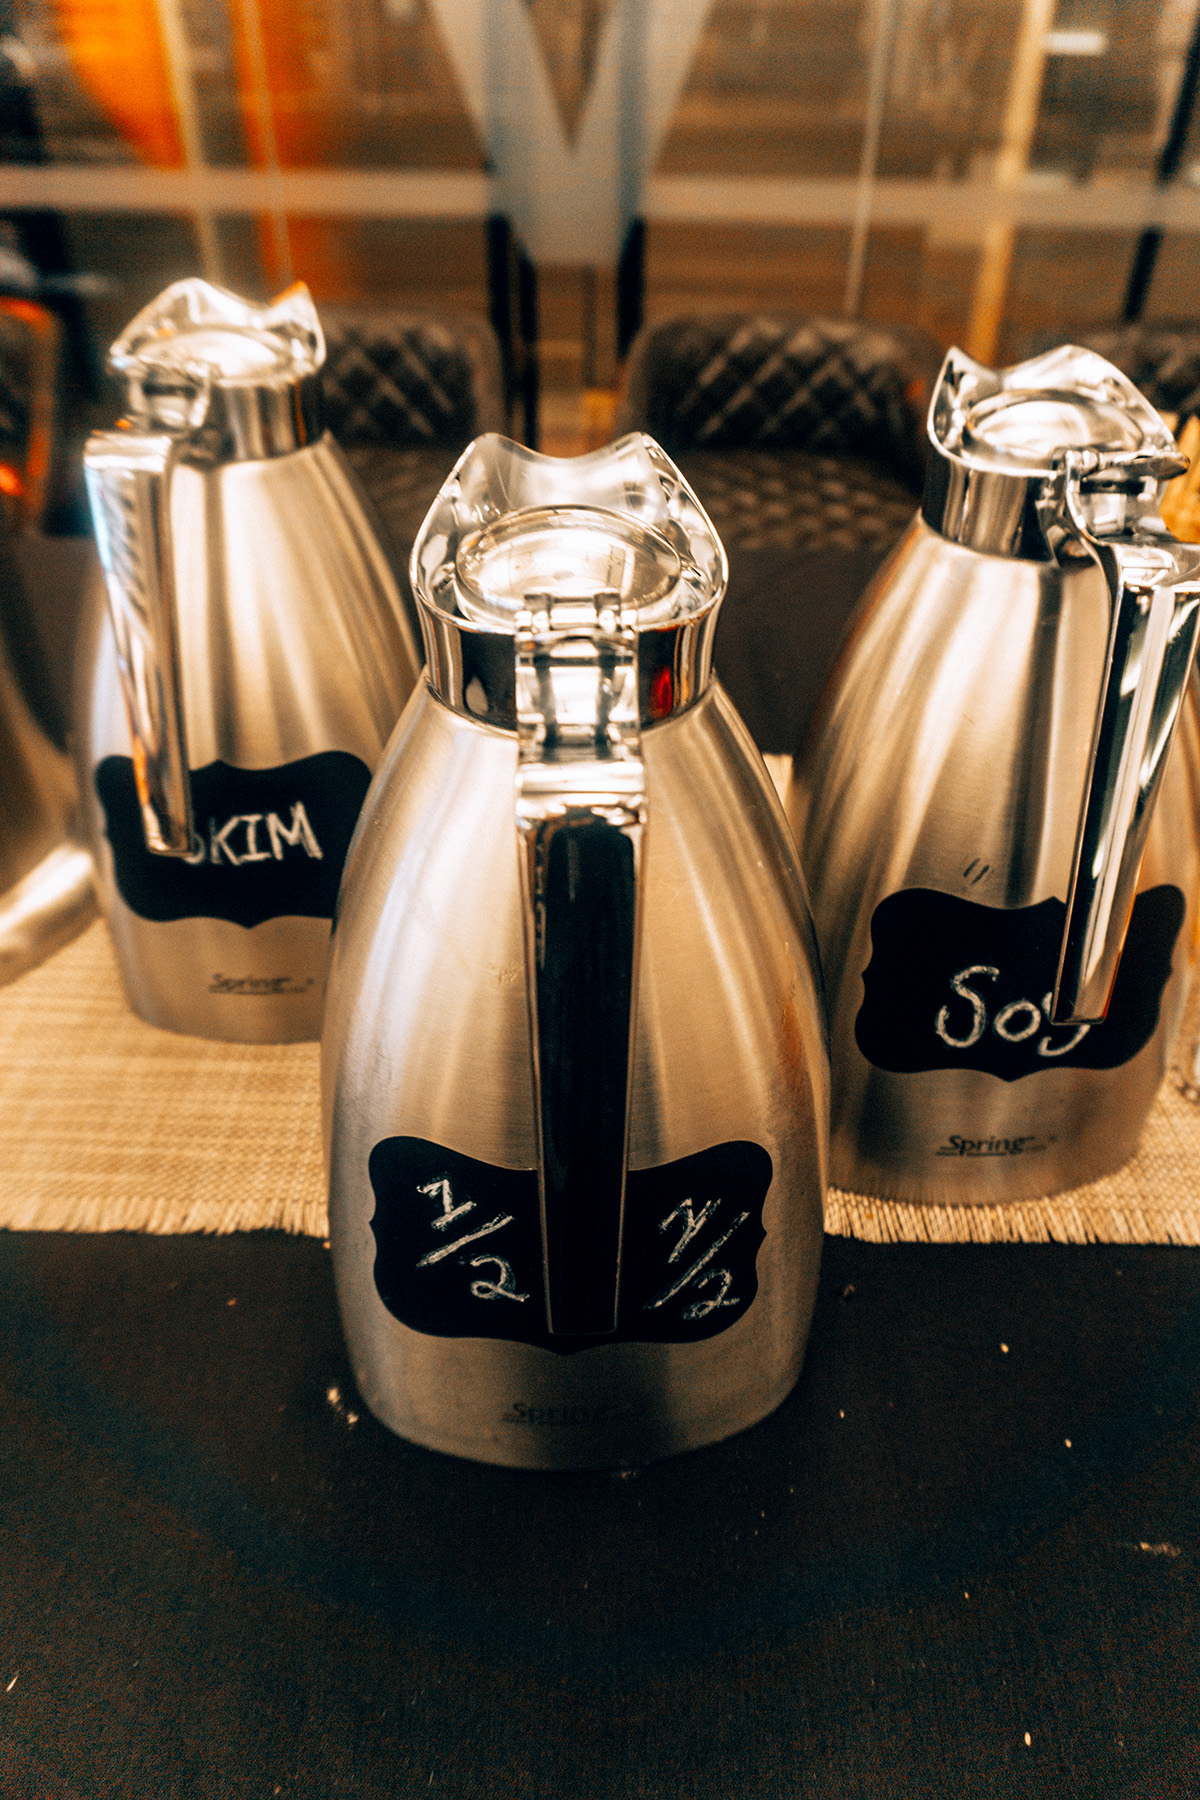 Hotel Vintage coffee bar milks